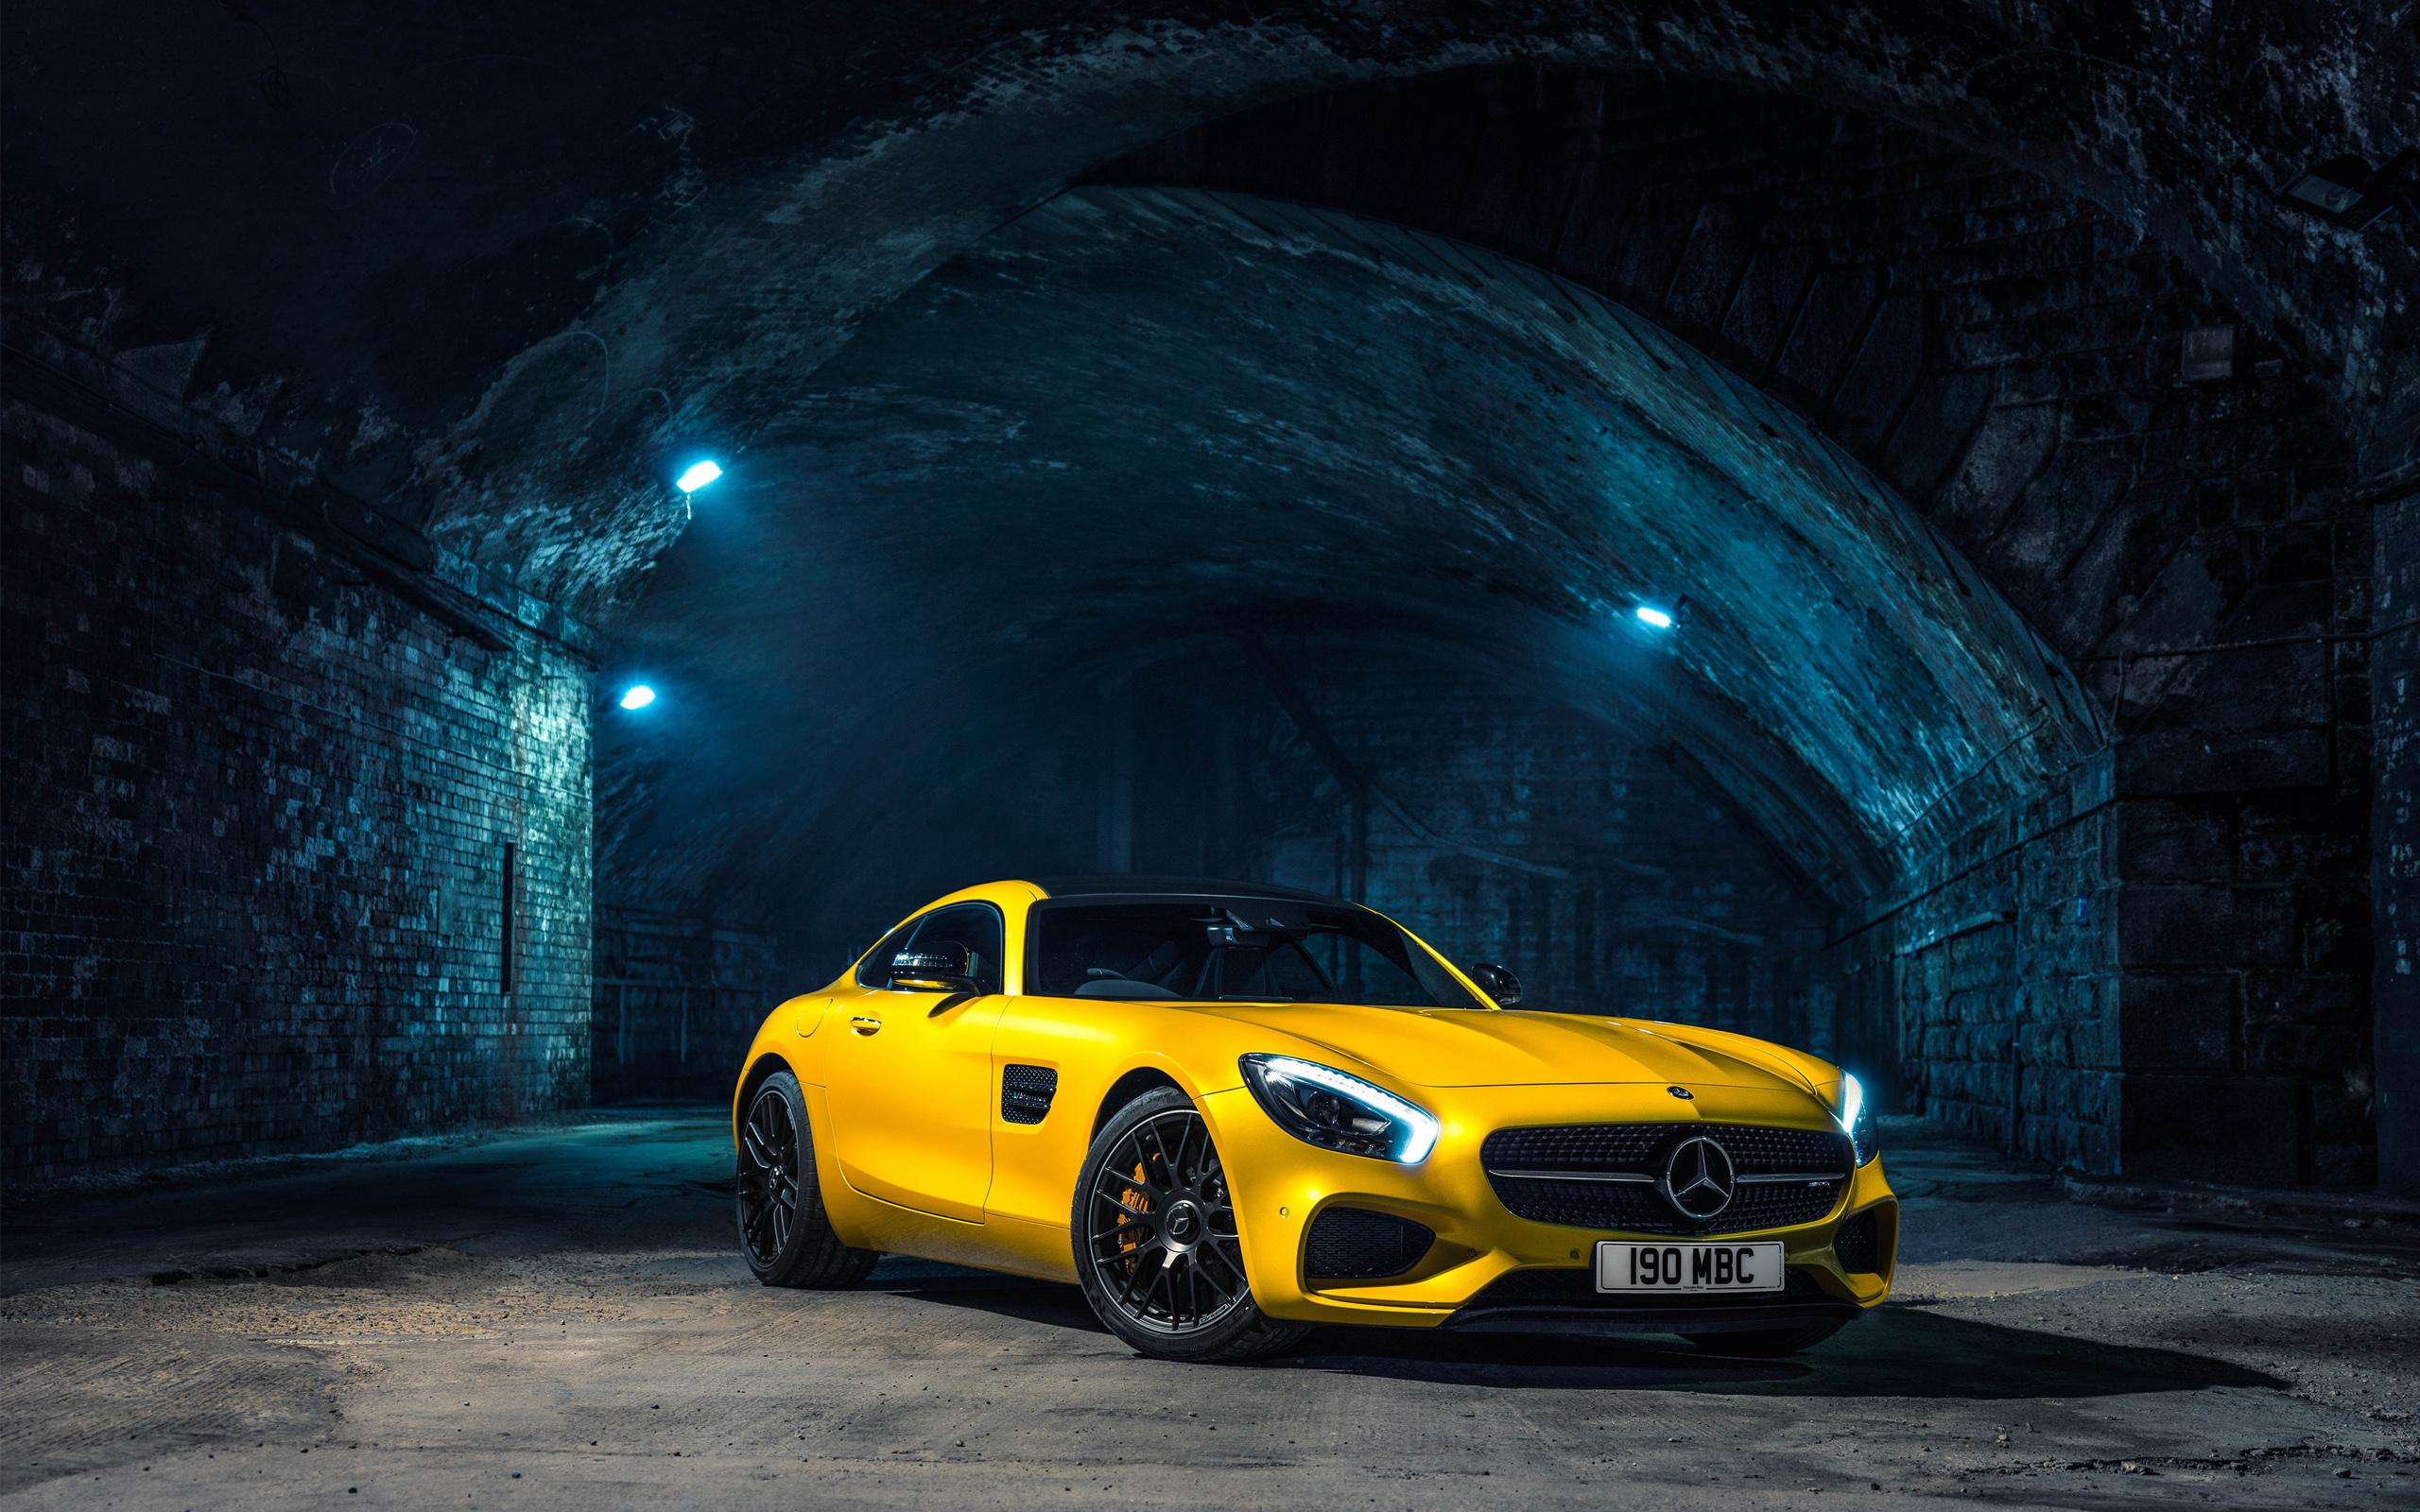 2015 Mercedes AMG GT S Wallpaper | HD Car Wallpapers| ID #5745